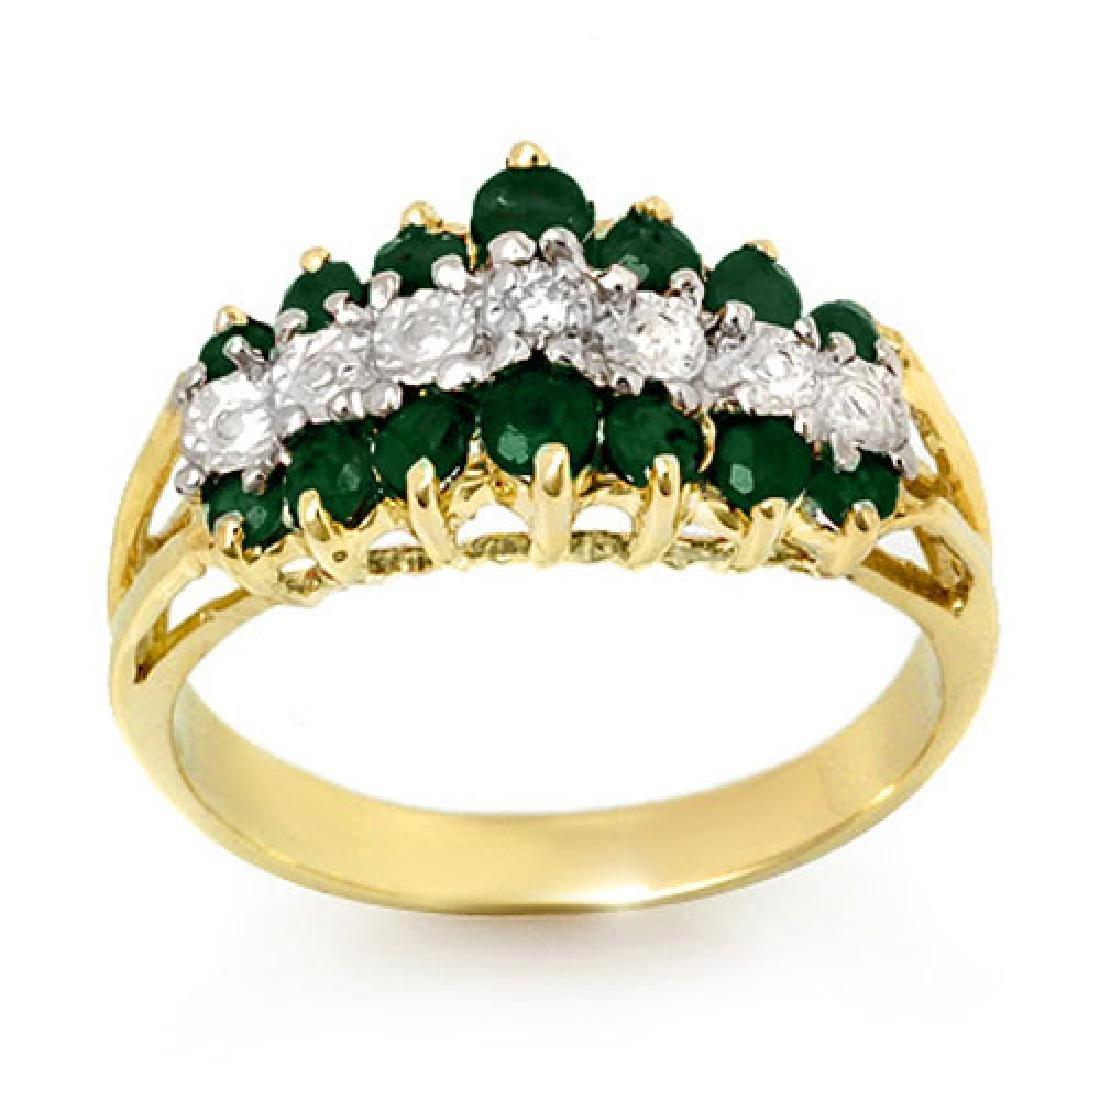 1.0 CTW Emerald & Diamond Ring 10K Yellow Gold